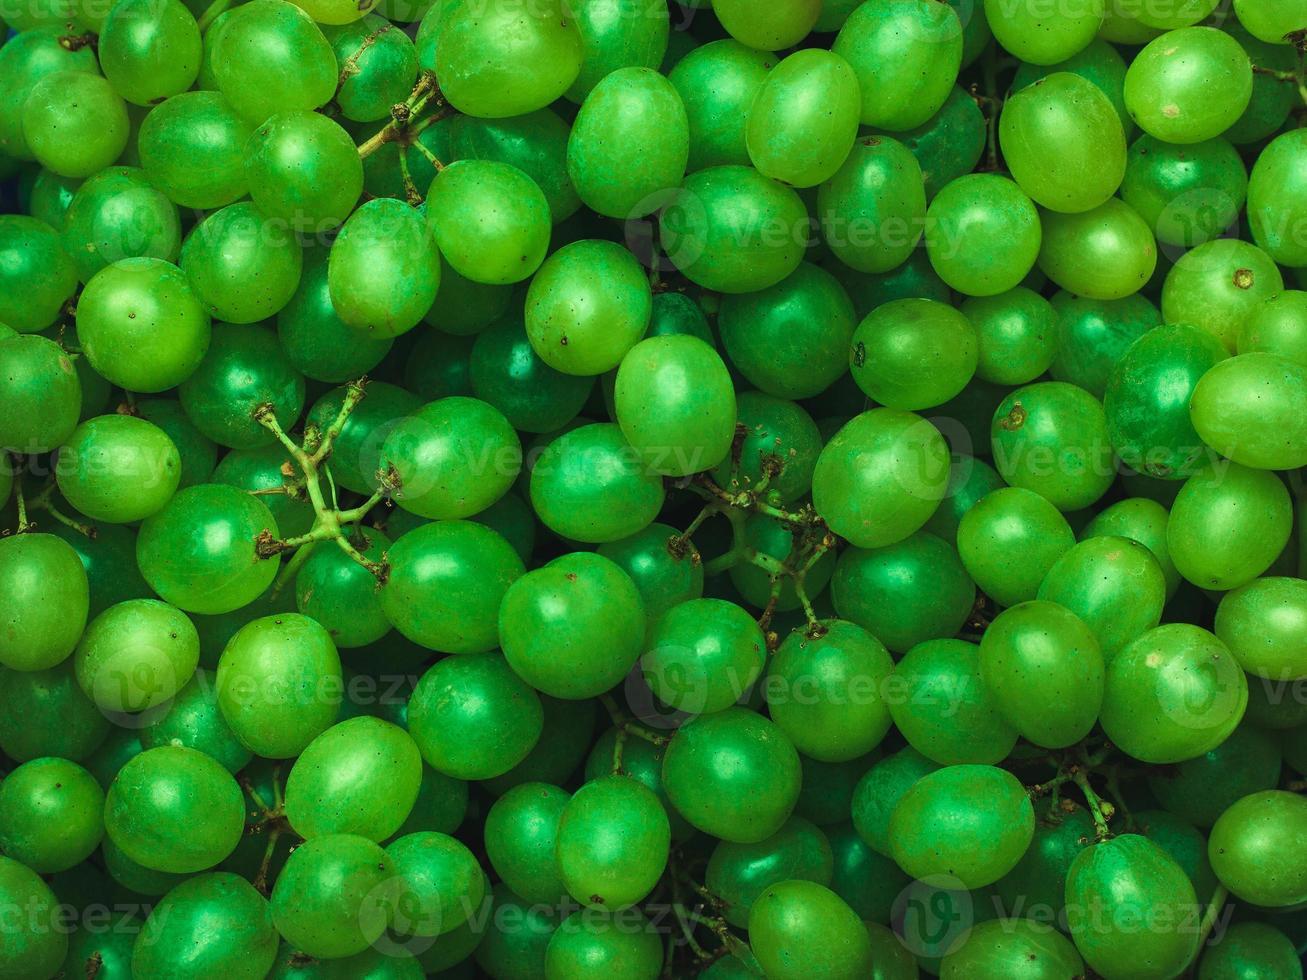 große grüne Trauben. foto